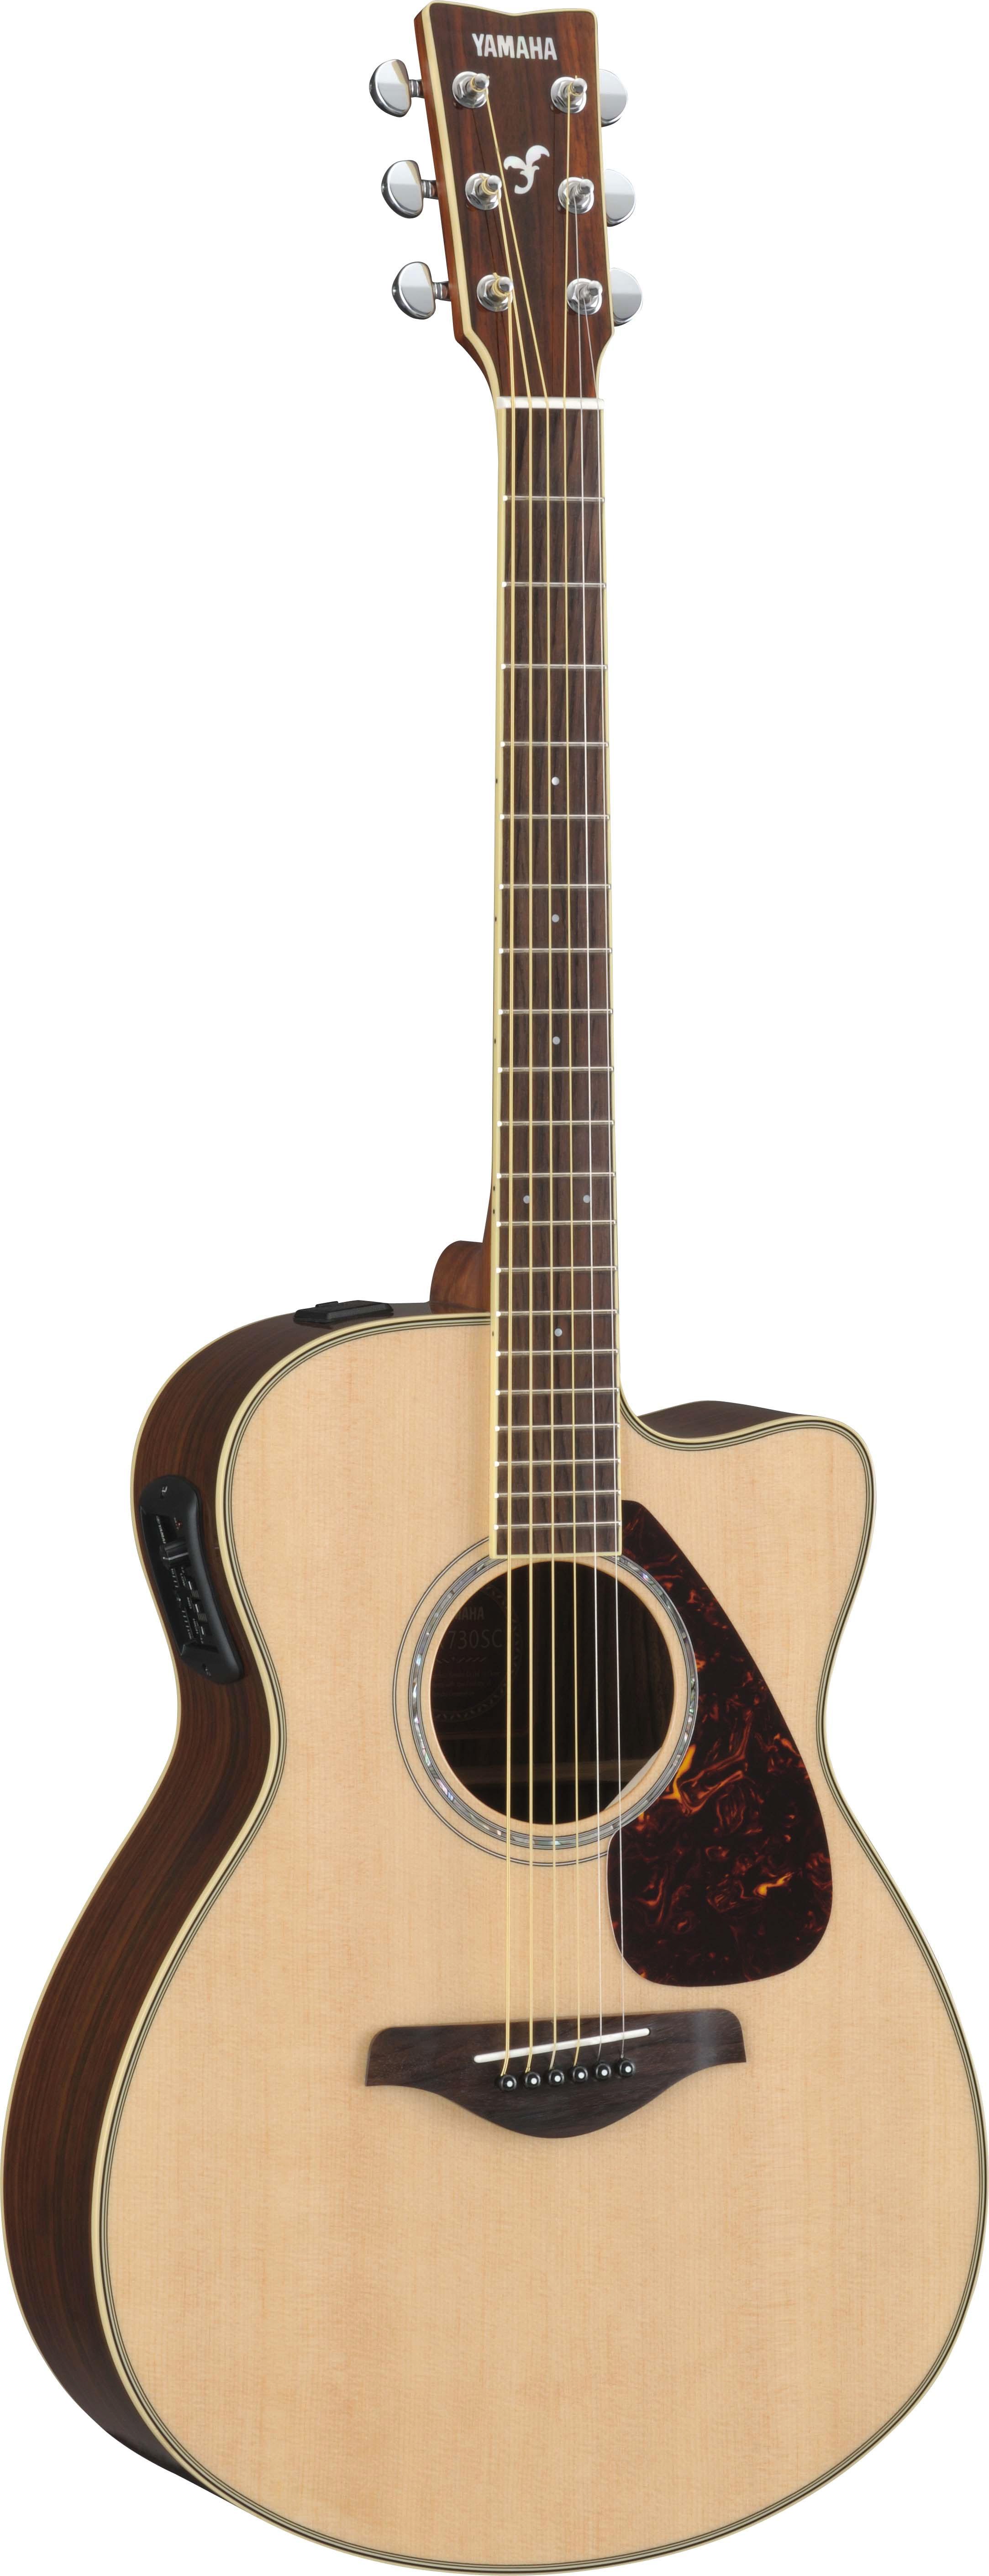 Yamaha Fgx Sc Acoustic Electric Guitar